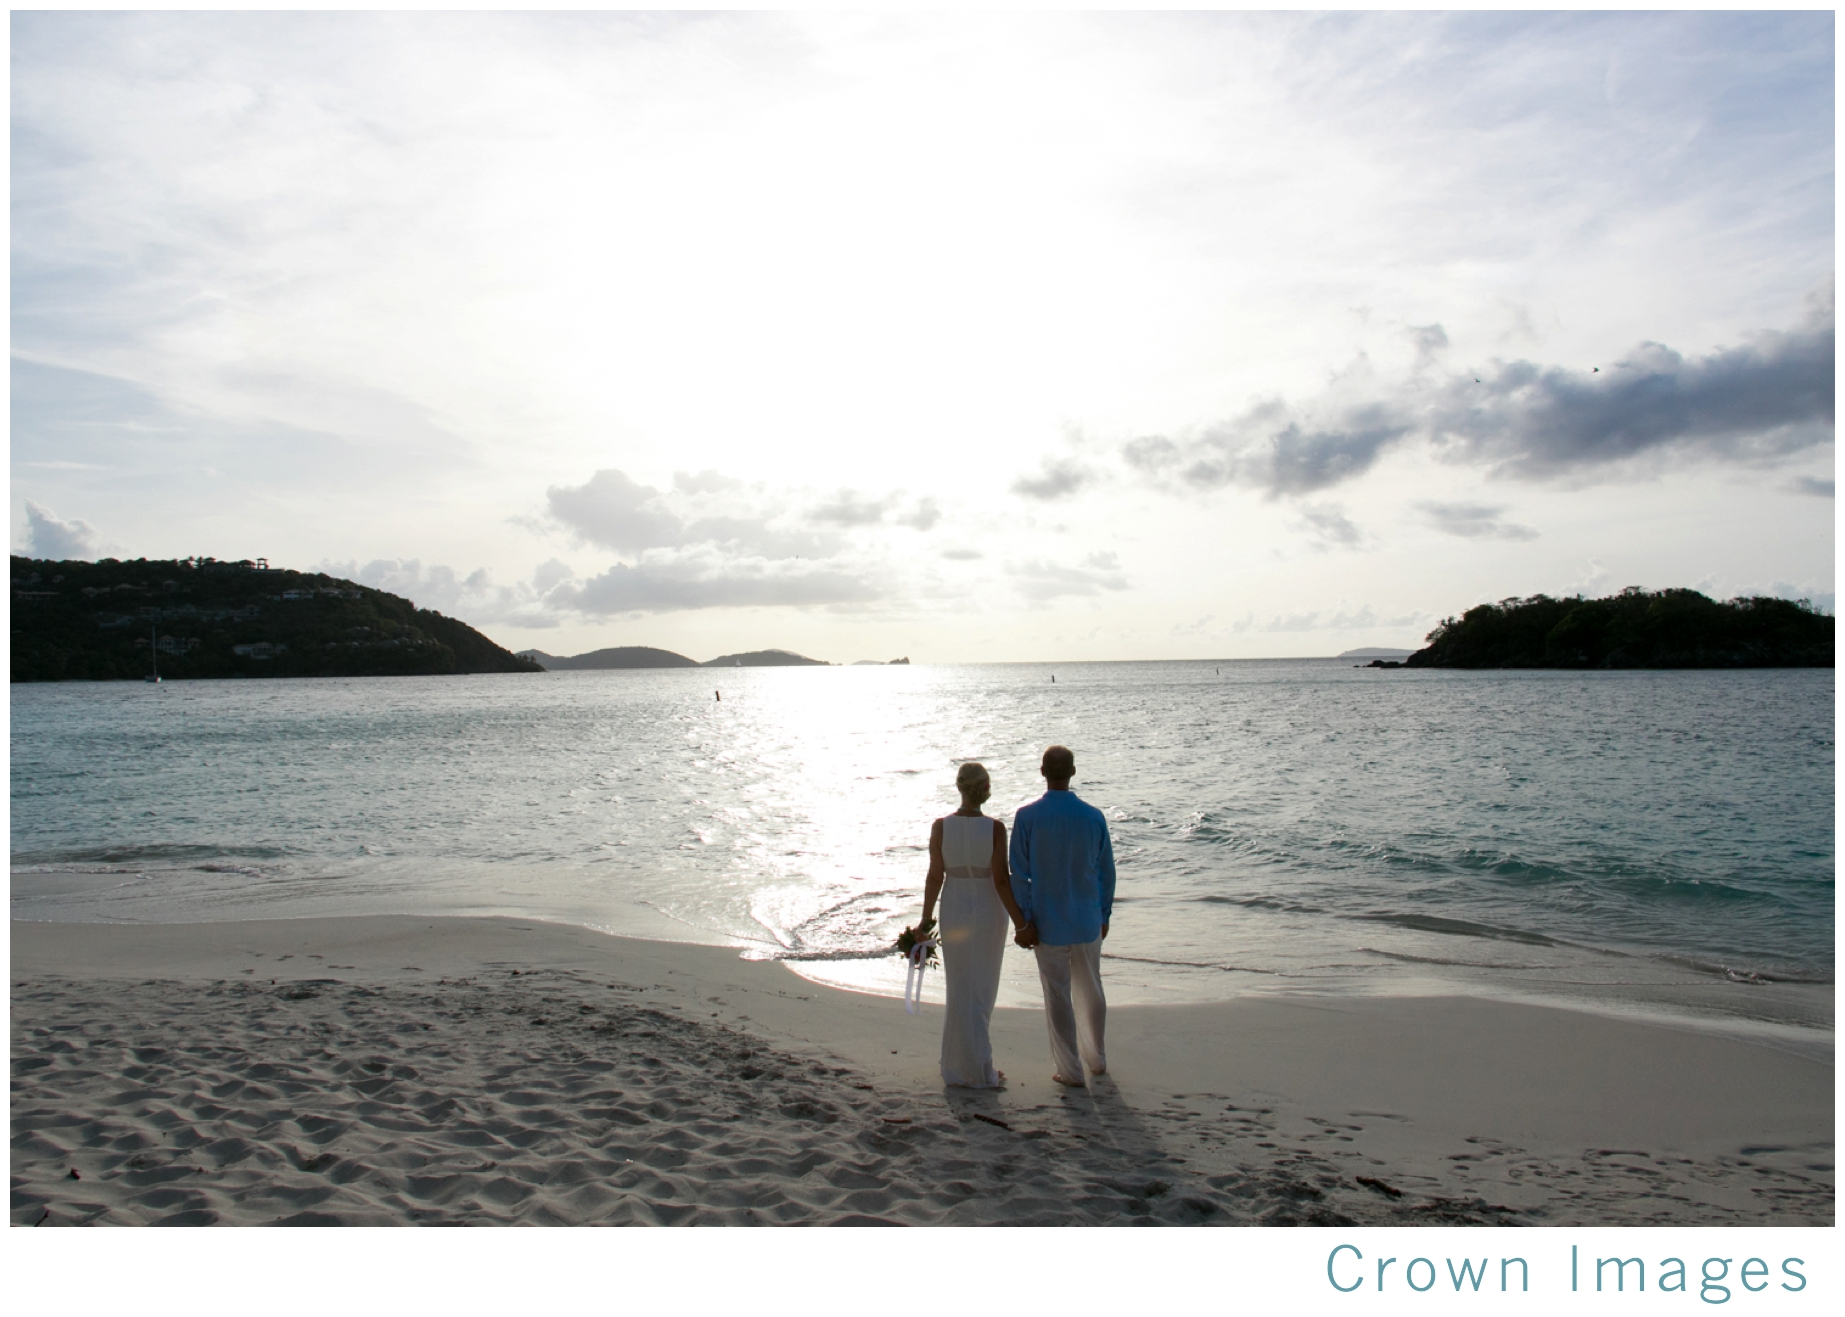 st_john_wedding_photographer_crown_images_0083.jpg